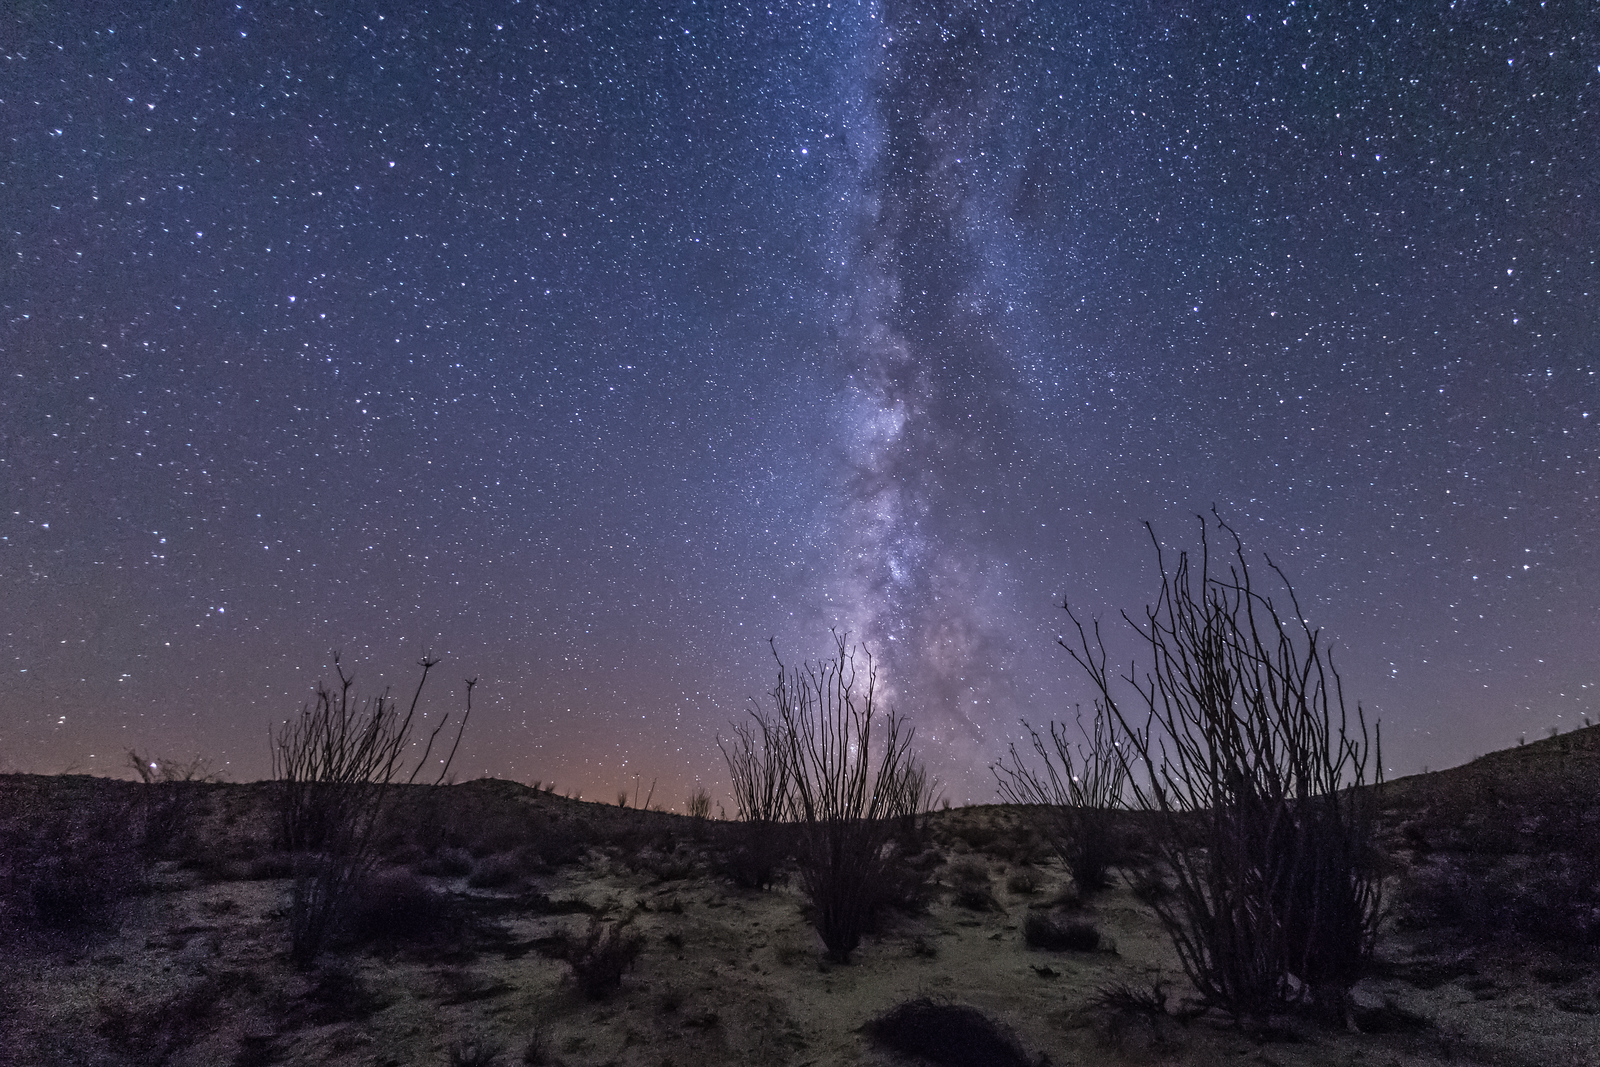 Ocotillo and the Milky Way in Anza-Borrego Desert